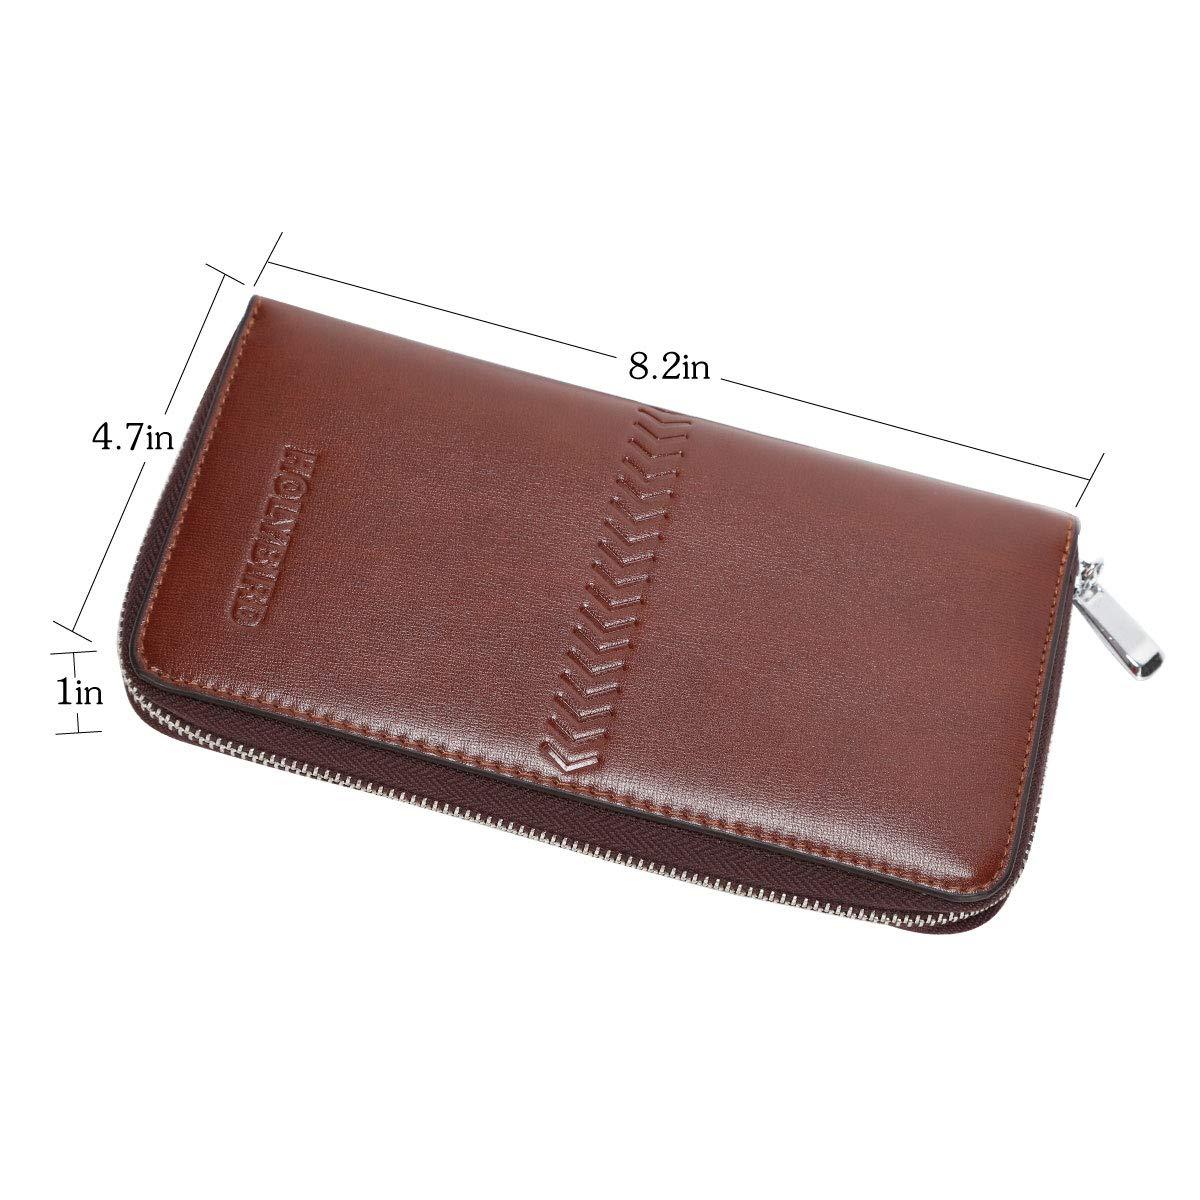 Mens Clutch Genuine Leather Handbag Organizer Checkbook Wallet Card Case by HOLYBIRD (Image #6)